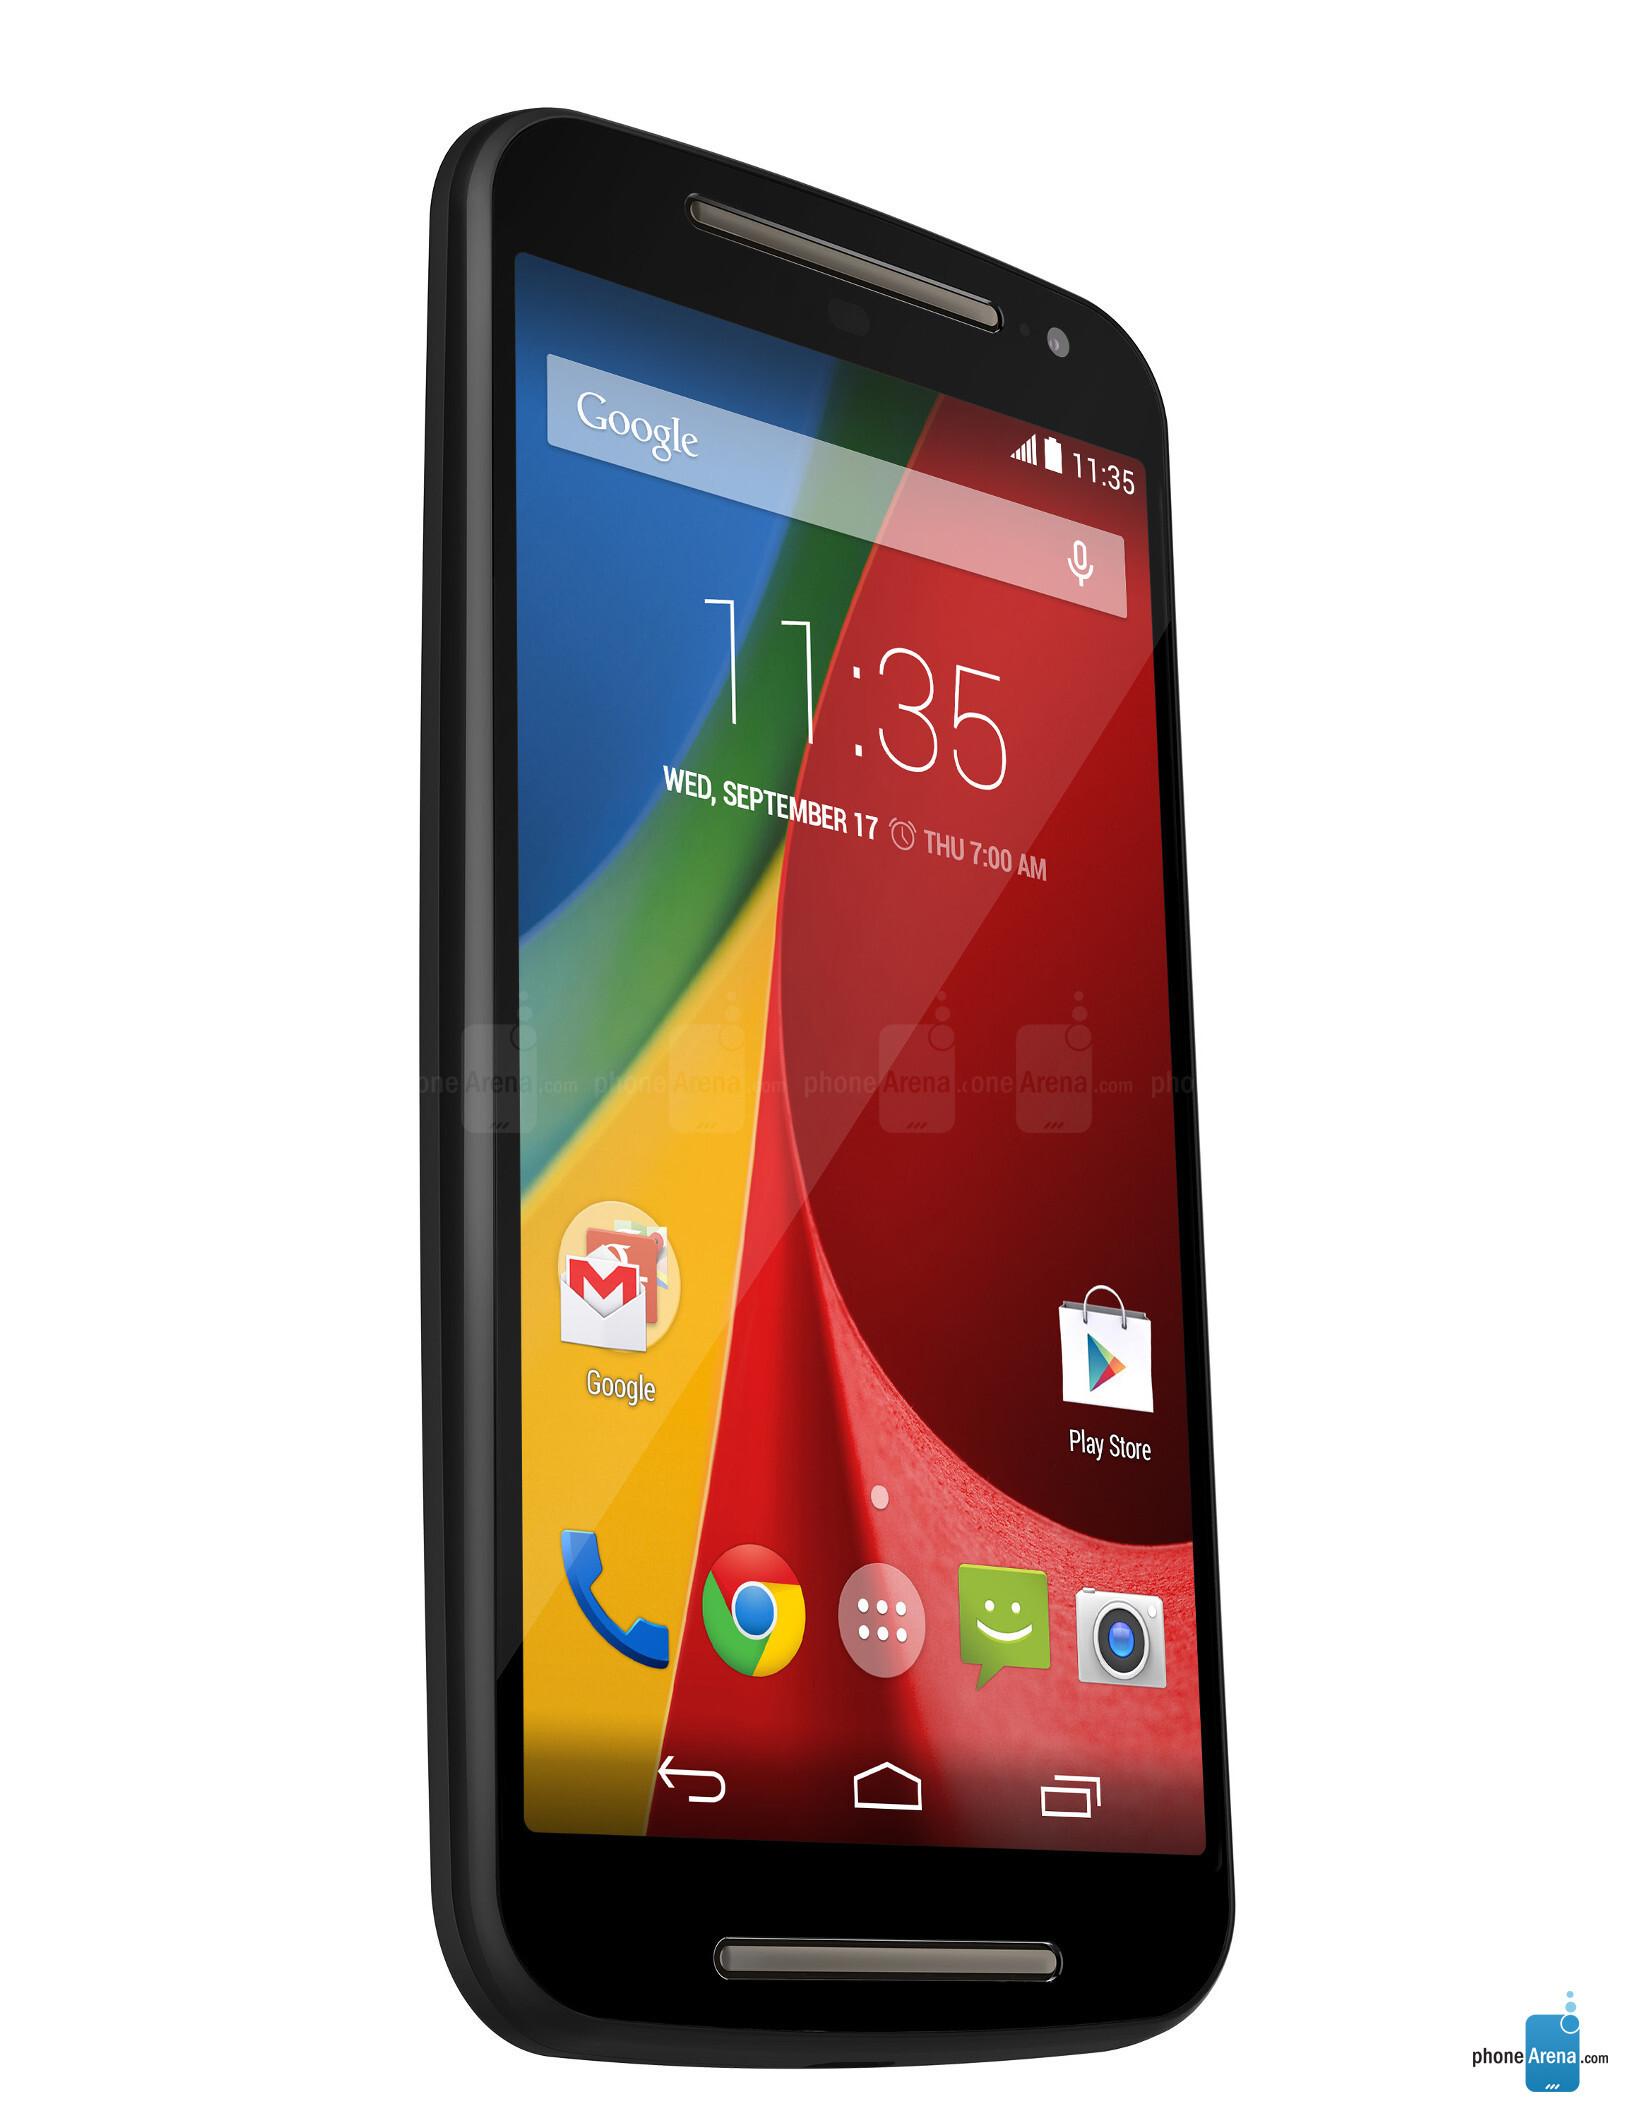 Camera Motorola Android Phone Price spice android phone price images guru motorola moto g